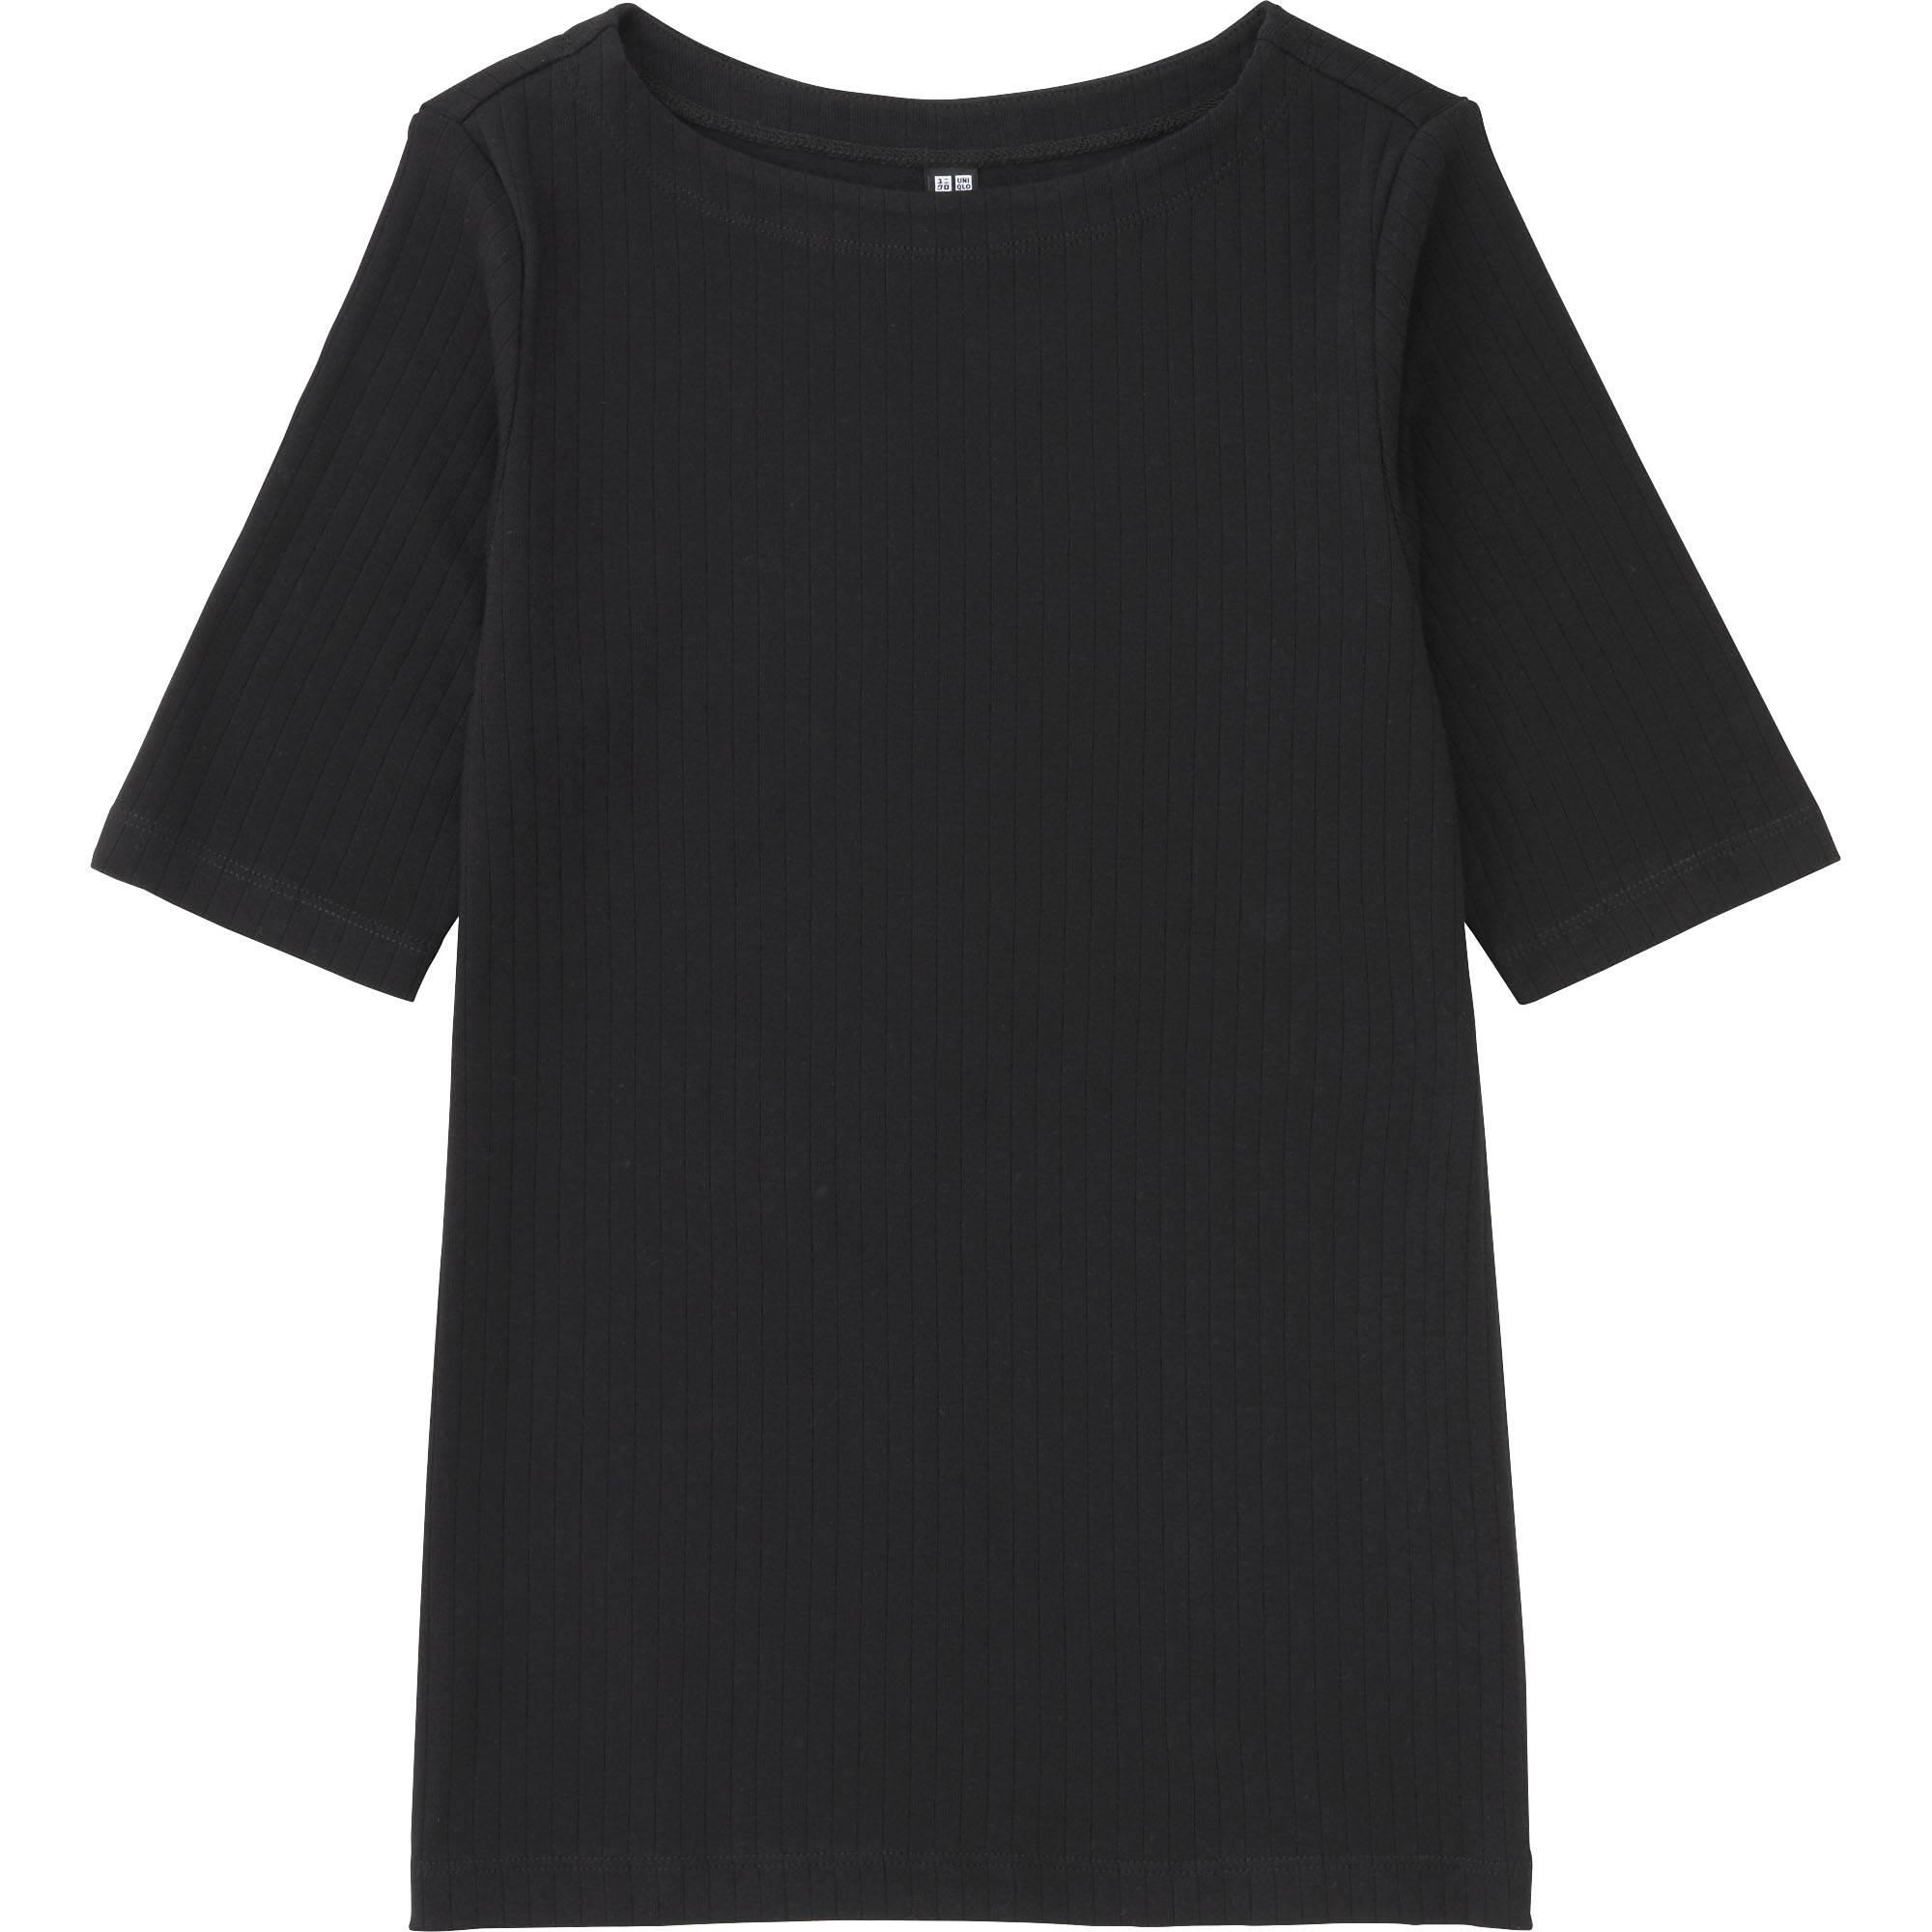 Black t shirt womens - Women Ribbed Boat Neck Half Sleeve T Shirt Black Small